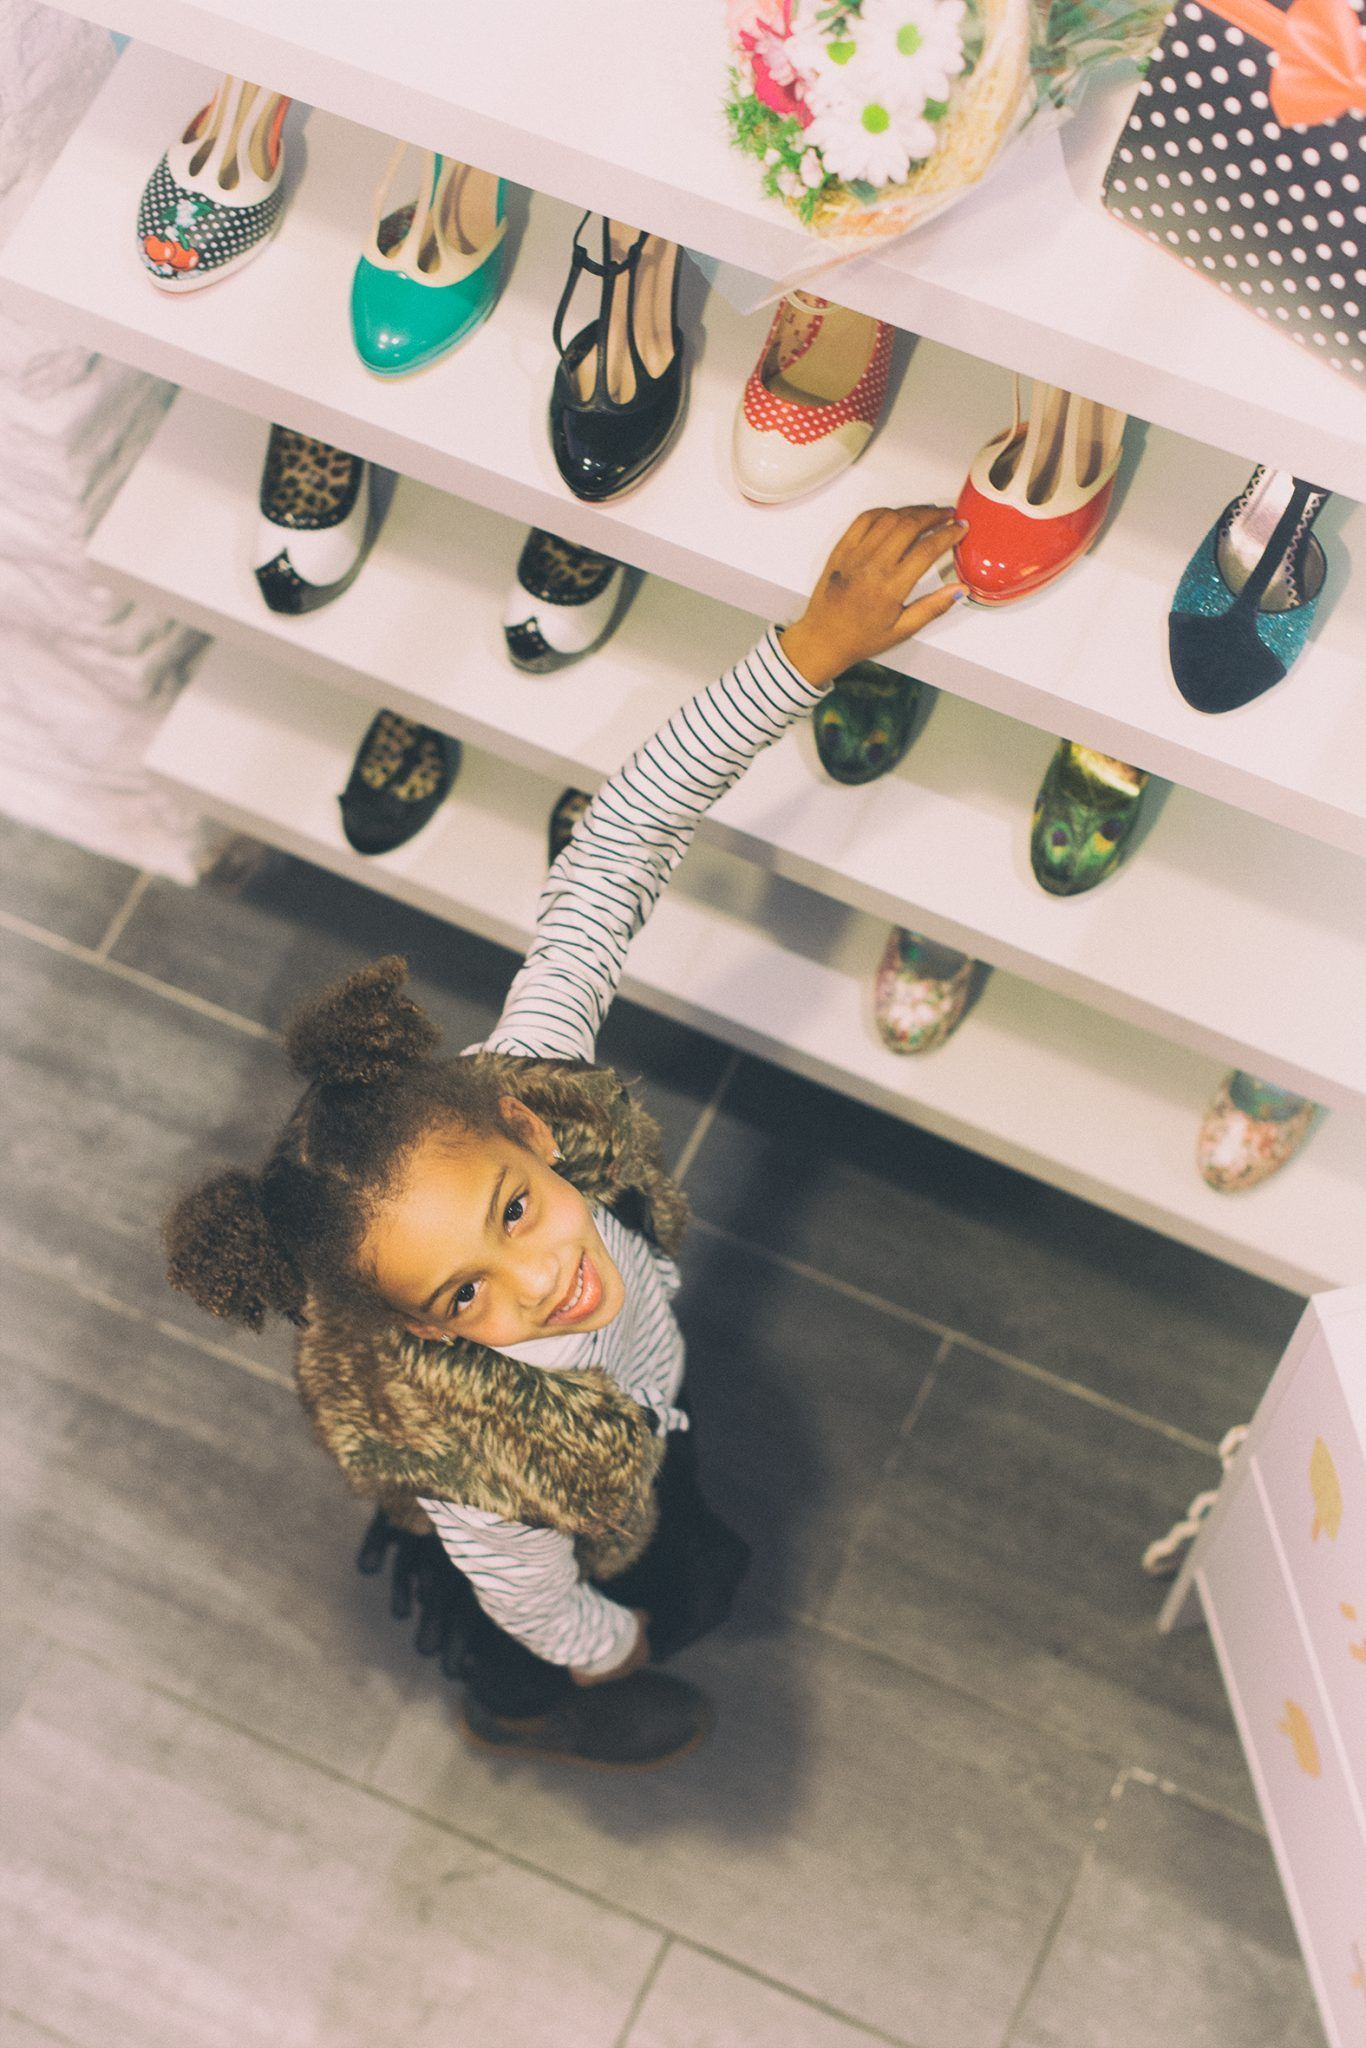 Zapatos Pin Up, Zapatos importados de USA y Londres